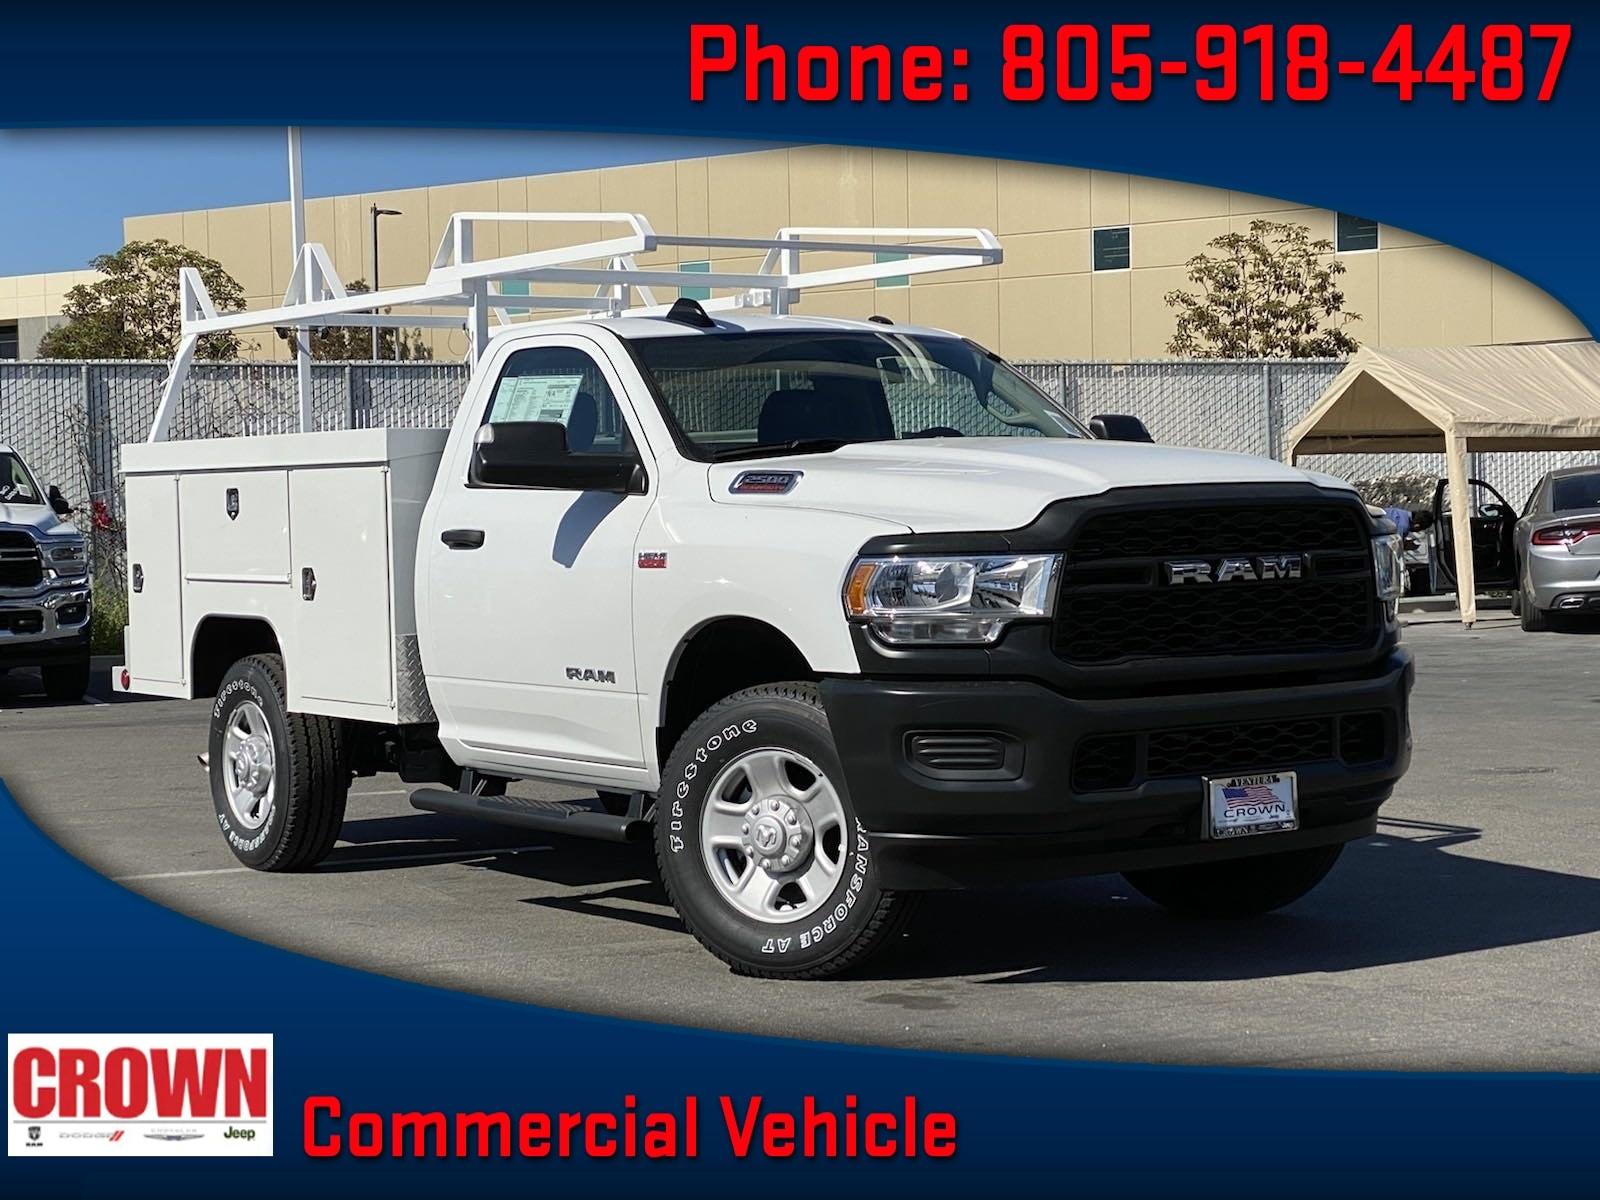 Crown Dodge Commercial Work Trucks And Vans